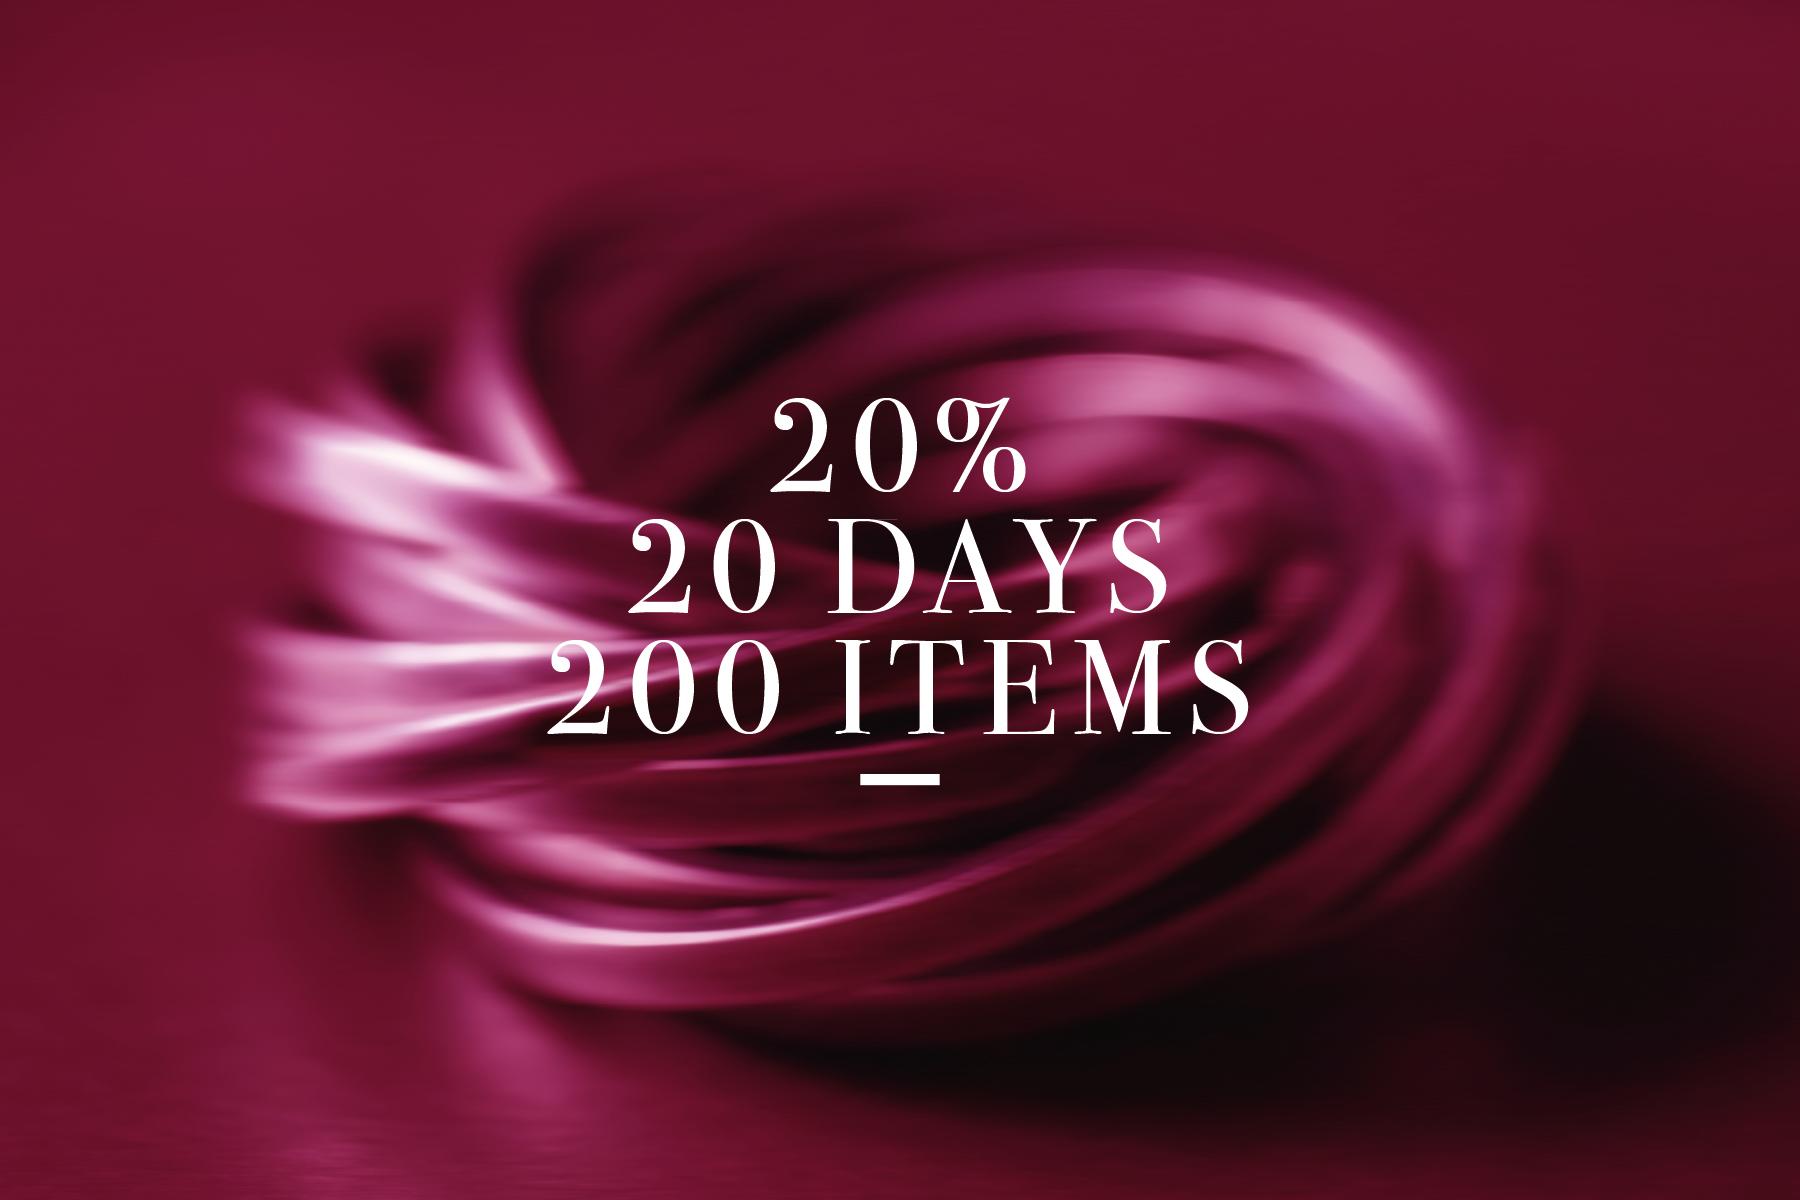 20 Days 20 Items Isabella Hund Gallery